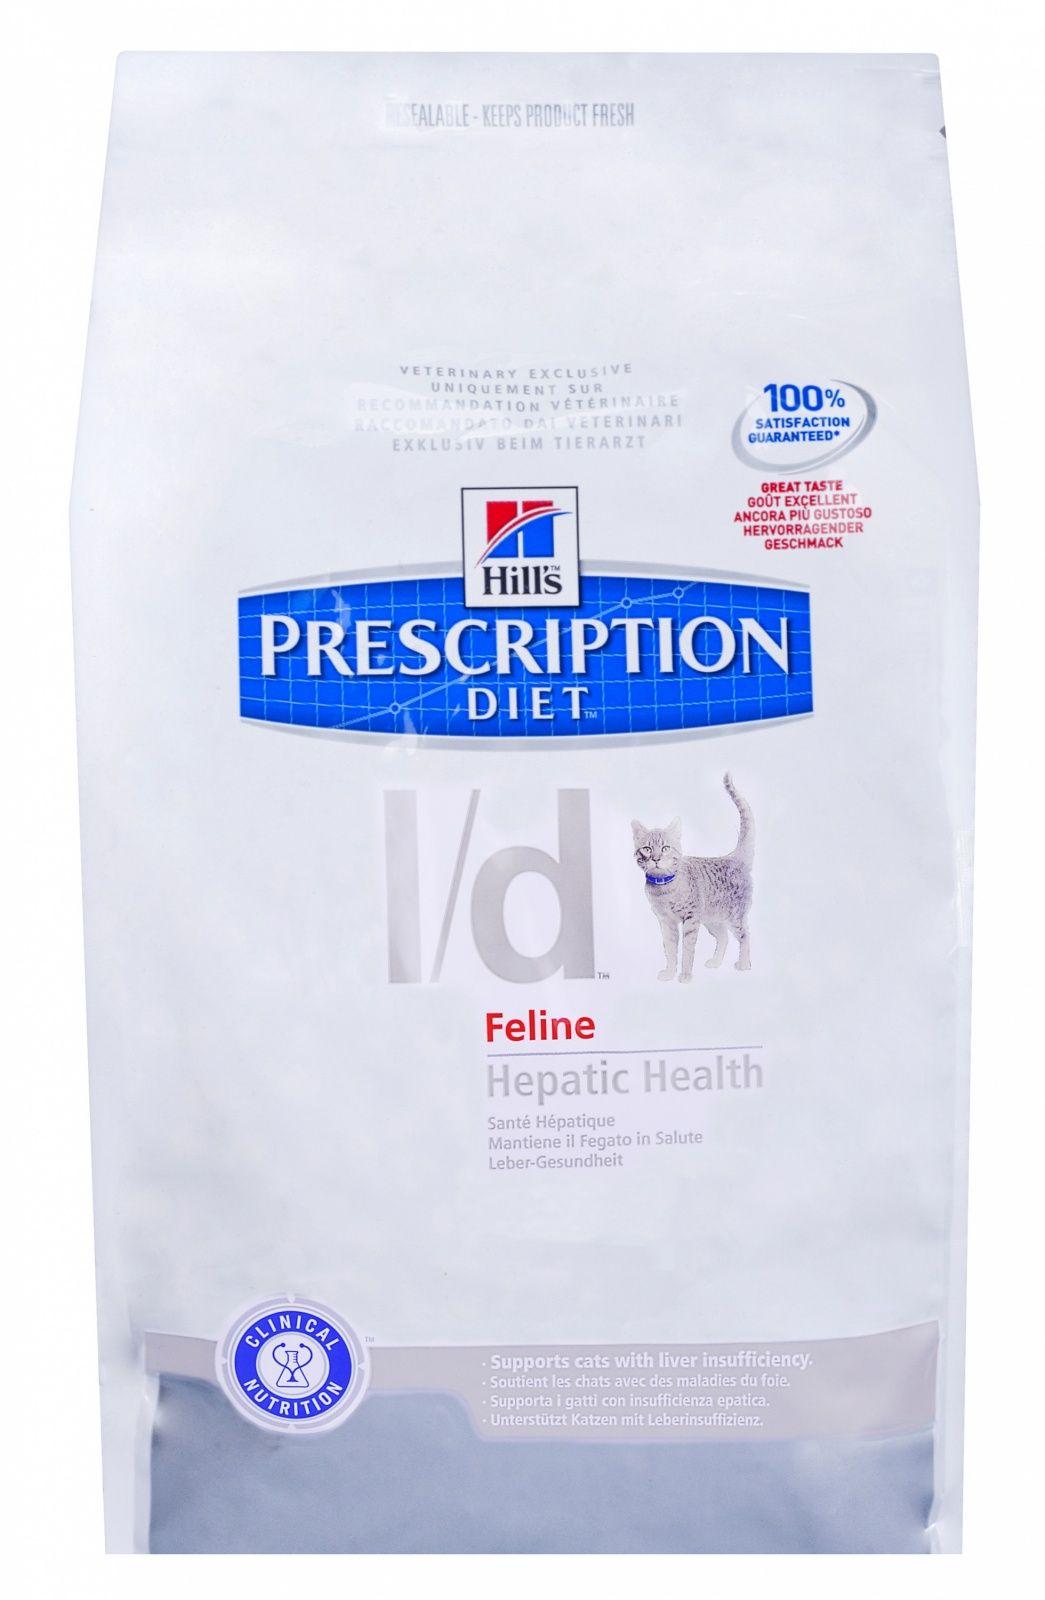 Диетический корм Hill's L/D для кошек лечение заболеваний печени, 1,5кг от Ravta